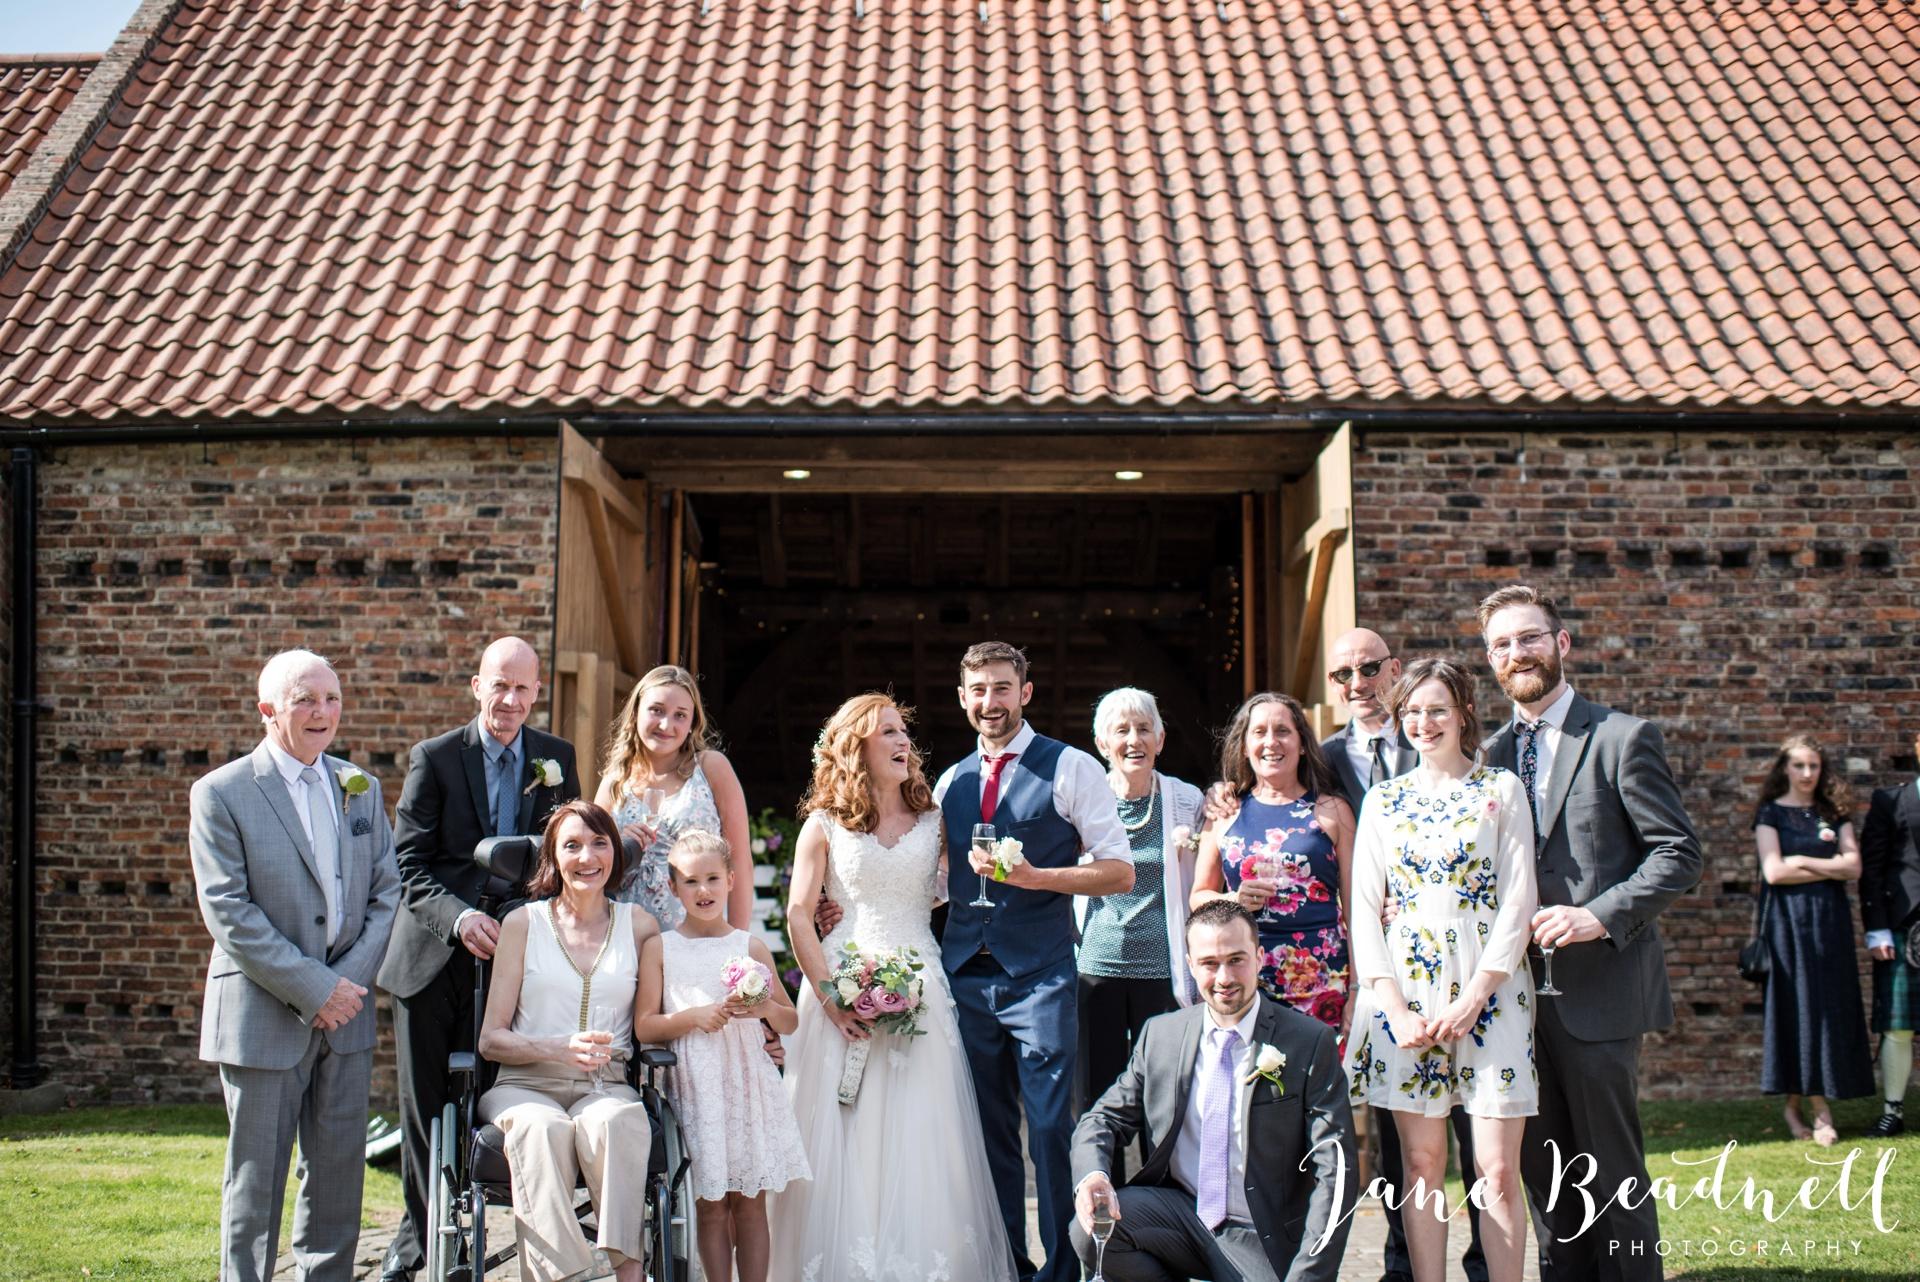 yorkshire-fine-art-wedding-photographer-jane-beadnell-photography-poppleton-york_0097